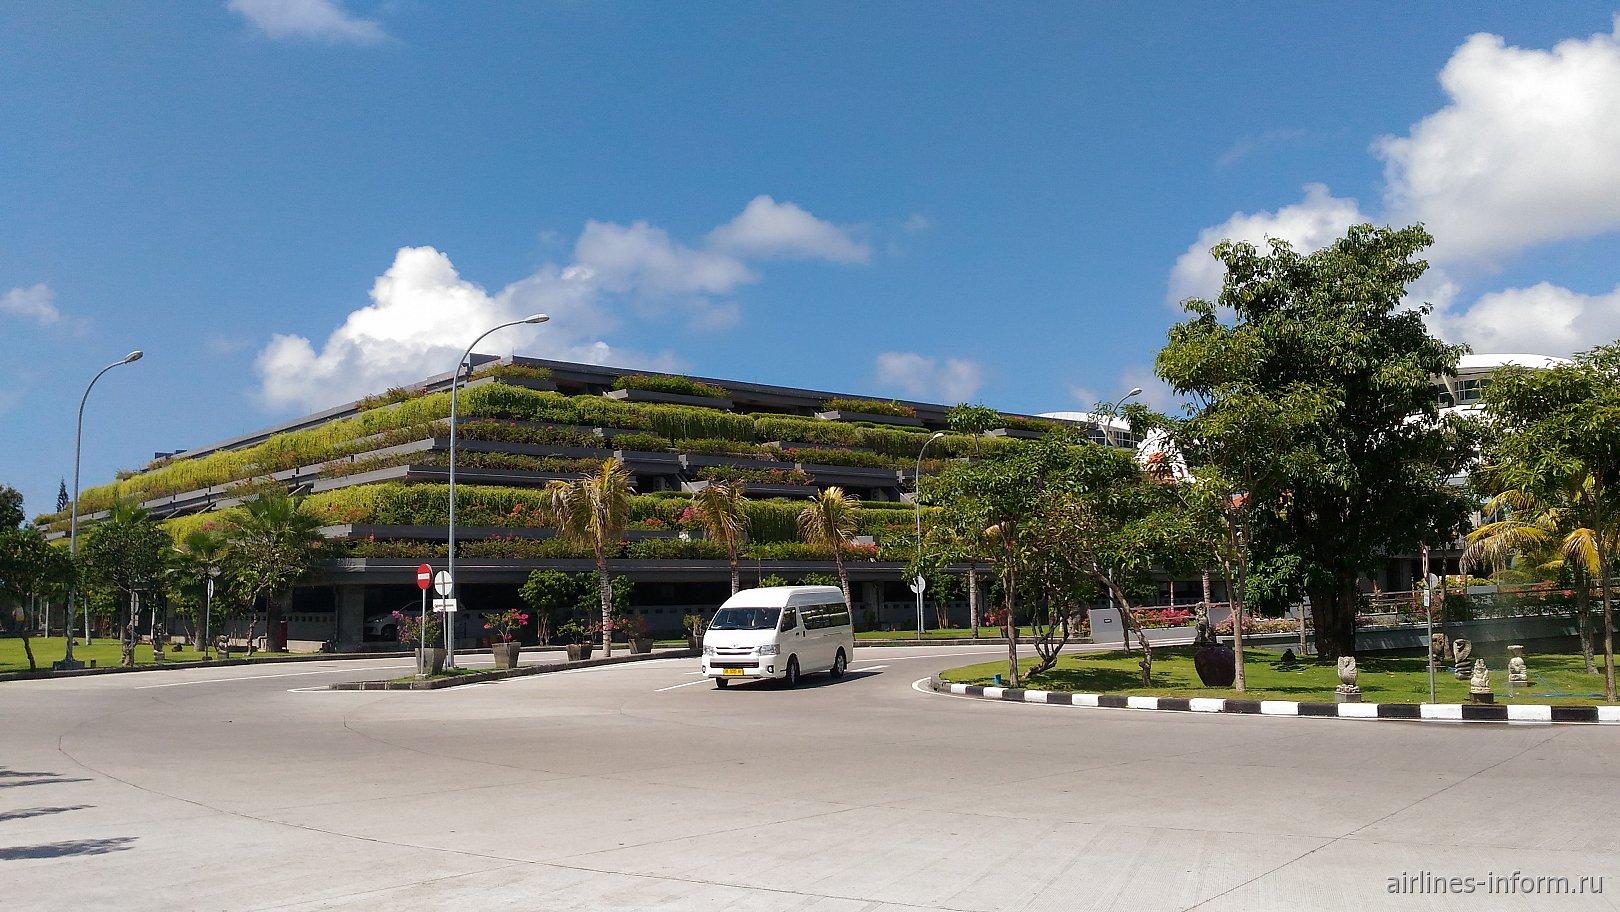 Автомобильная парковка в аэропорту Денпасар Нгура Рай